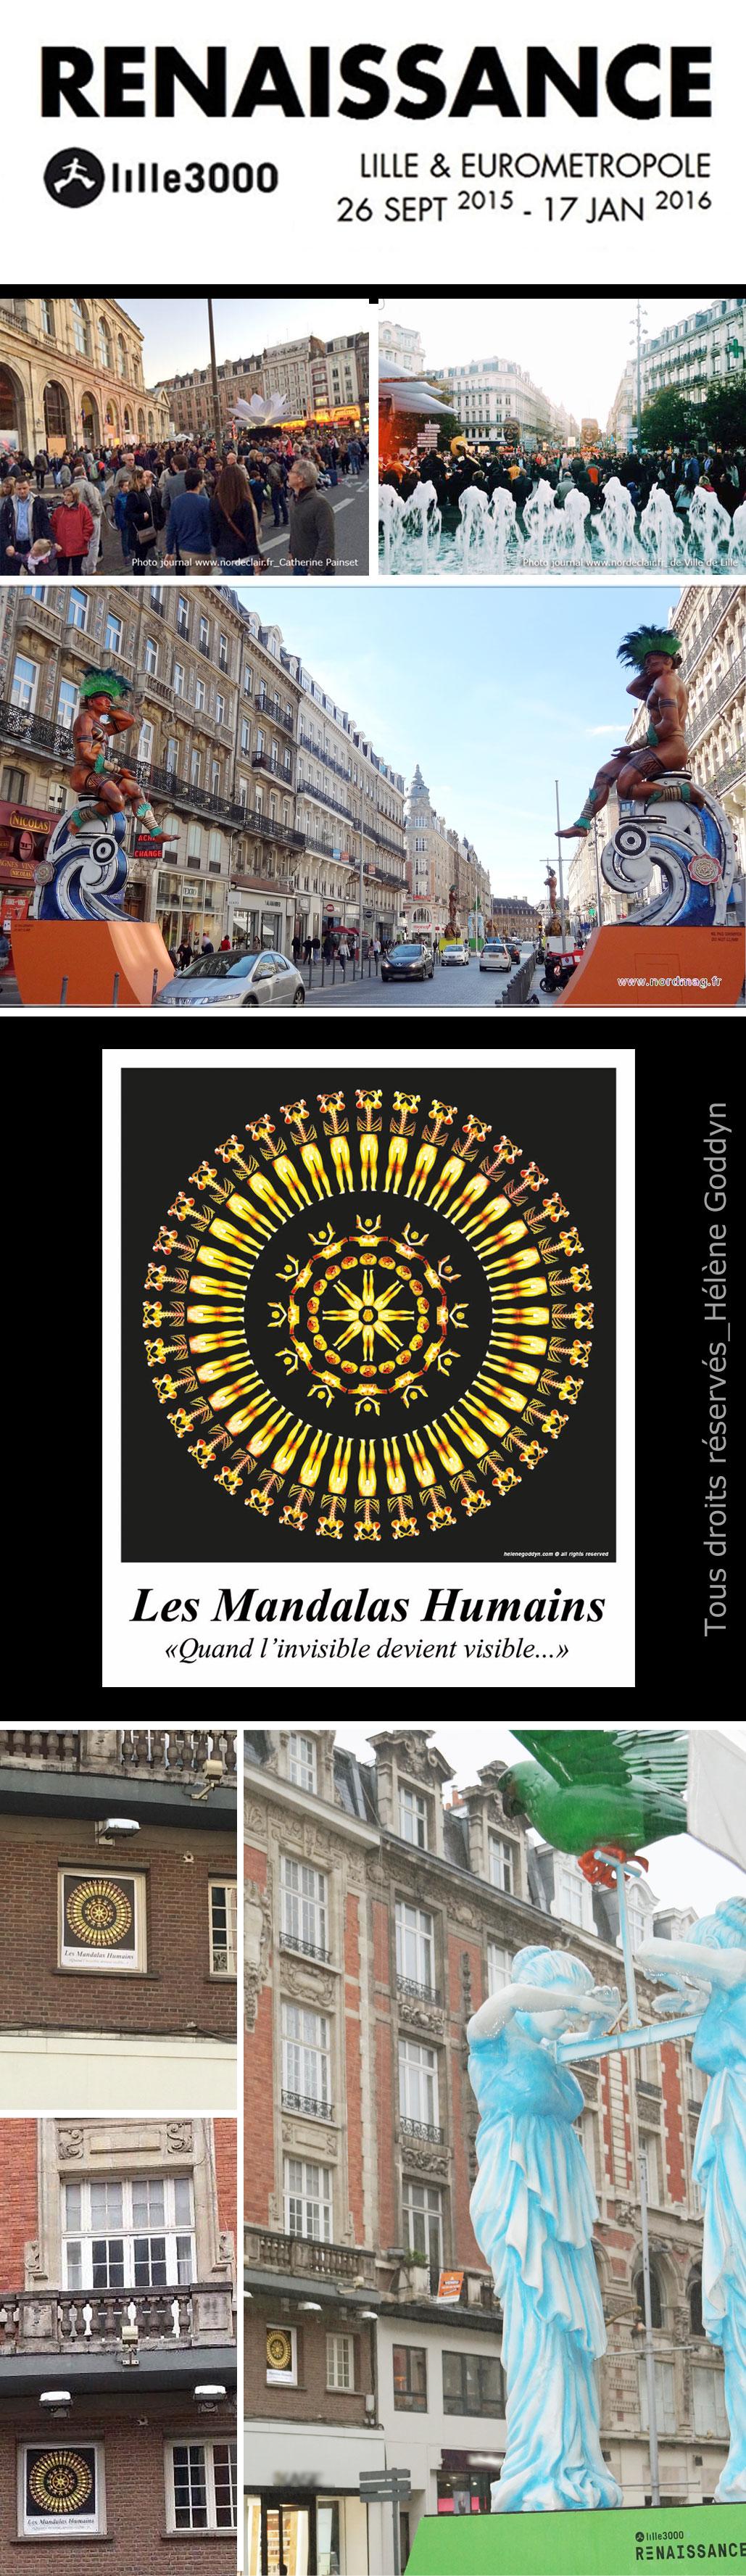 Renaissance_lille_Mandala-Humain_installation-urbaine_Goddyn-helene_rue-Faidherbe_Rayonnement_Soleil_installation-artistique